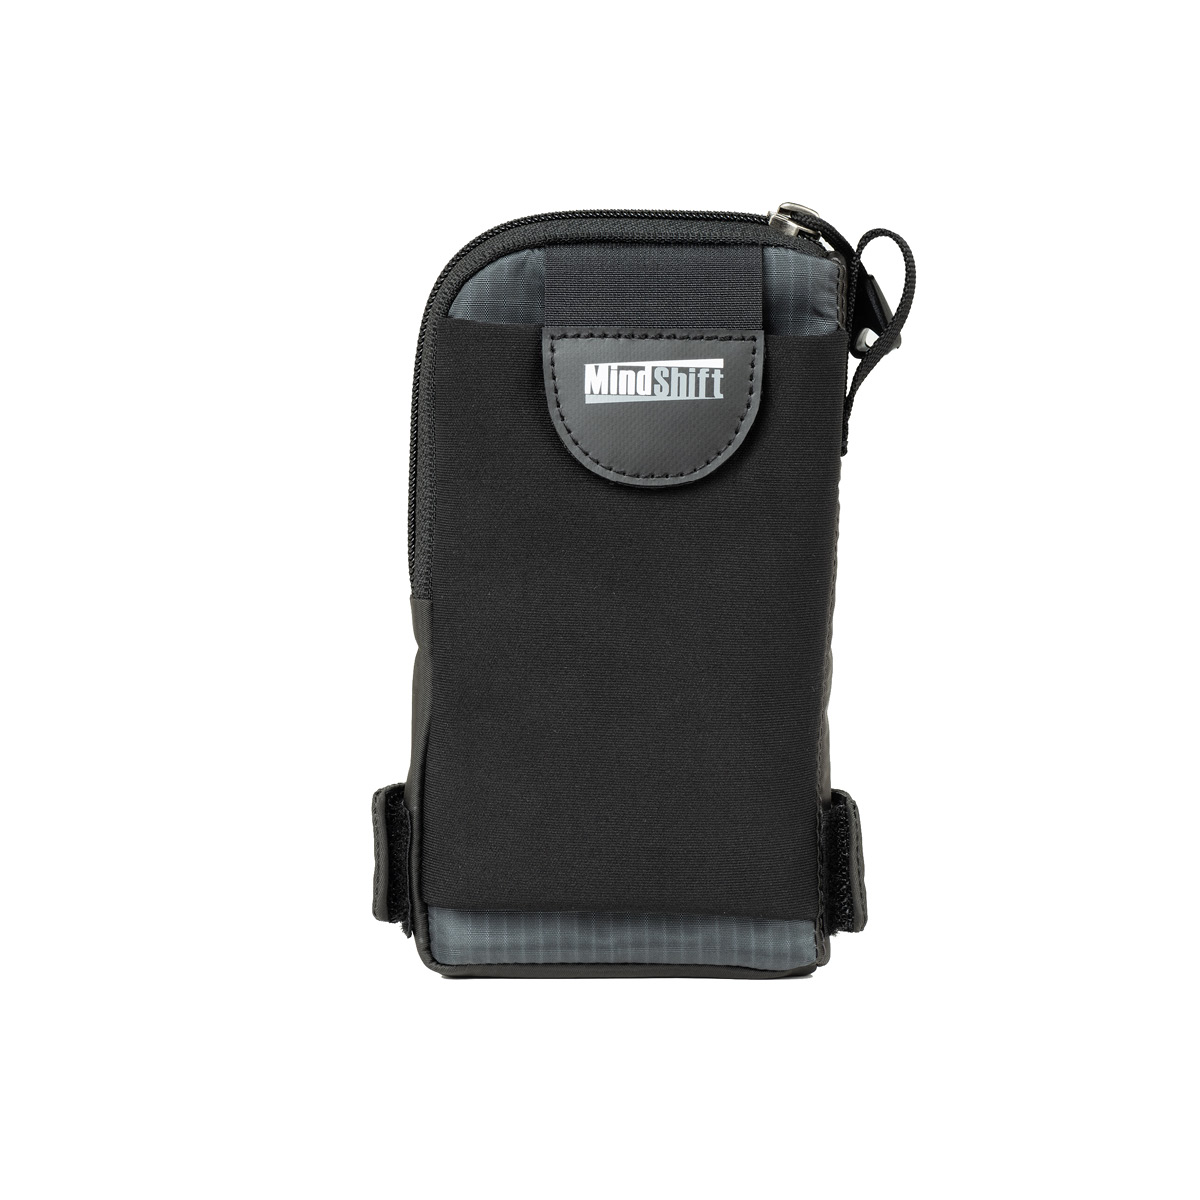 Mindshift Phone Holster